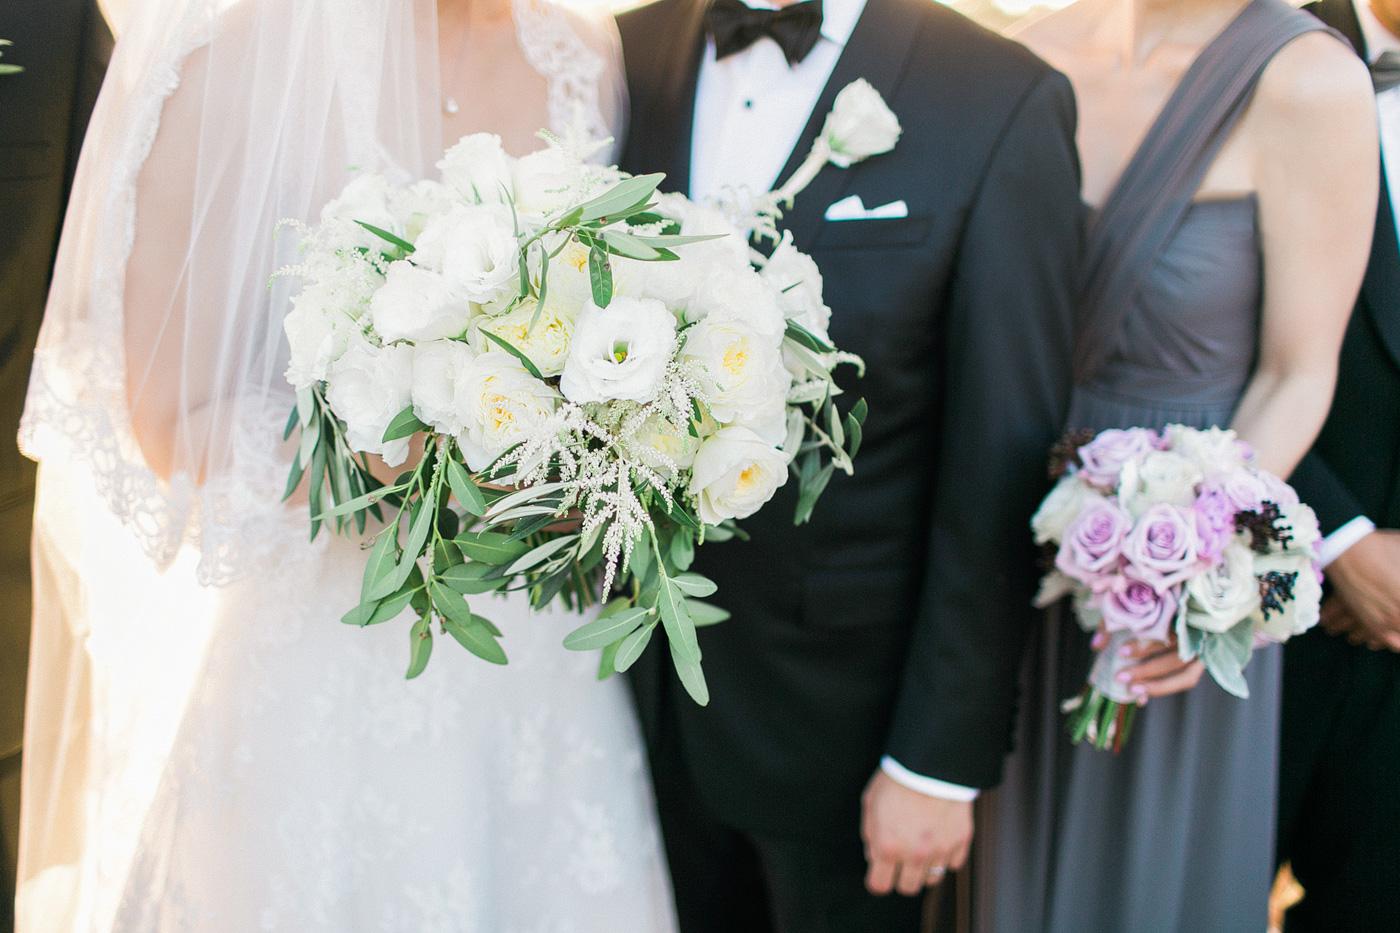 Pelican-hill-wedding-22